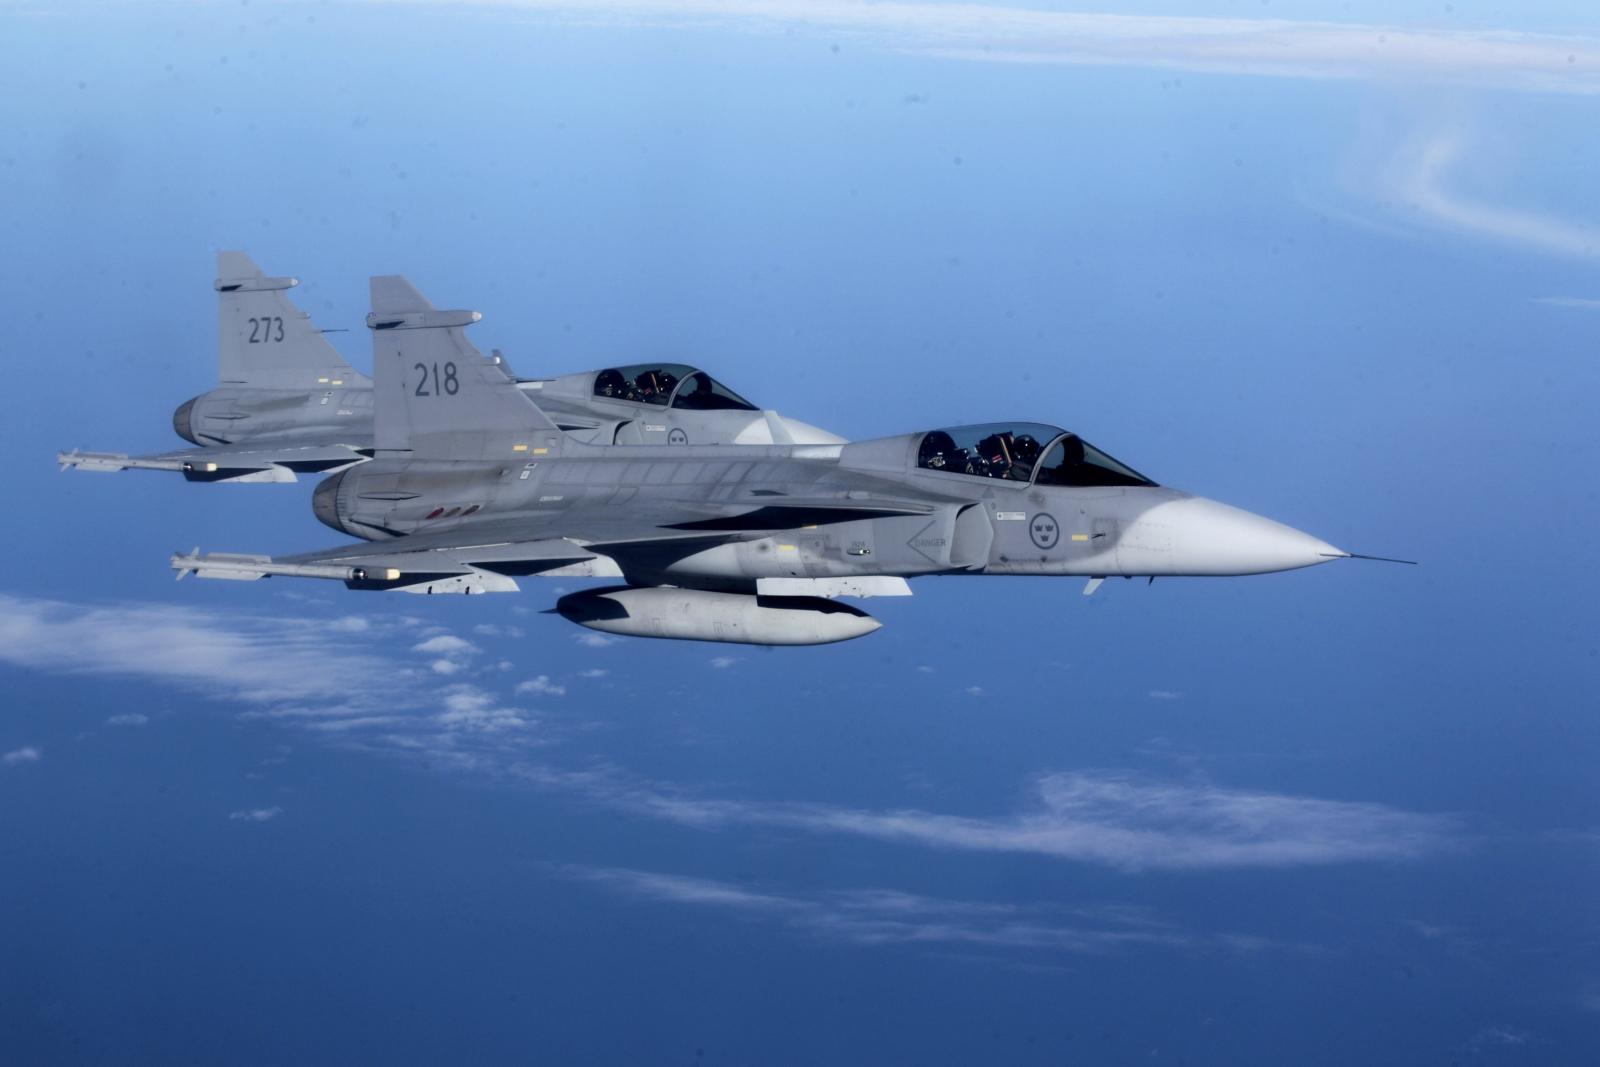 Sweden Air Force